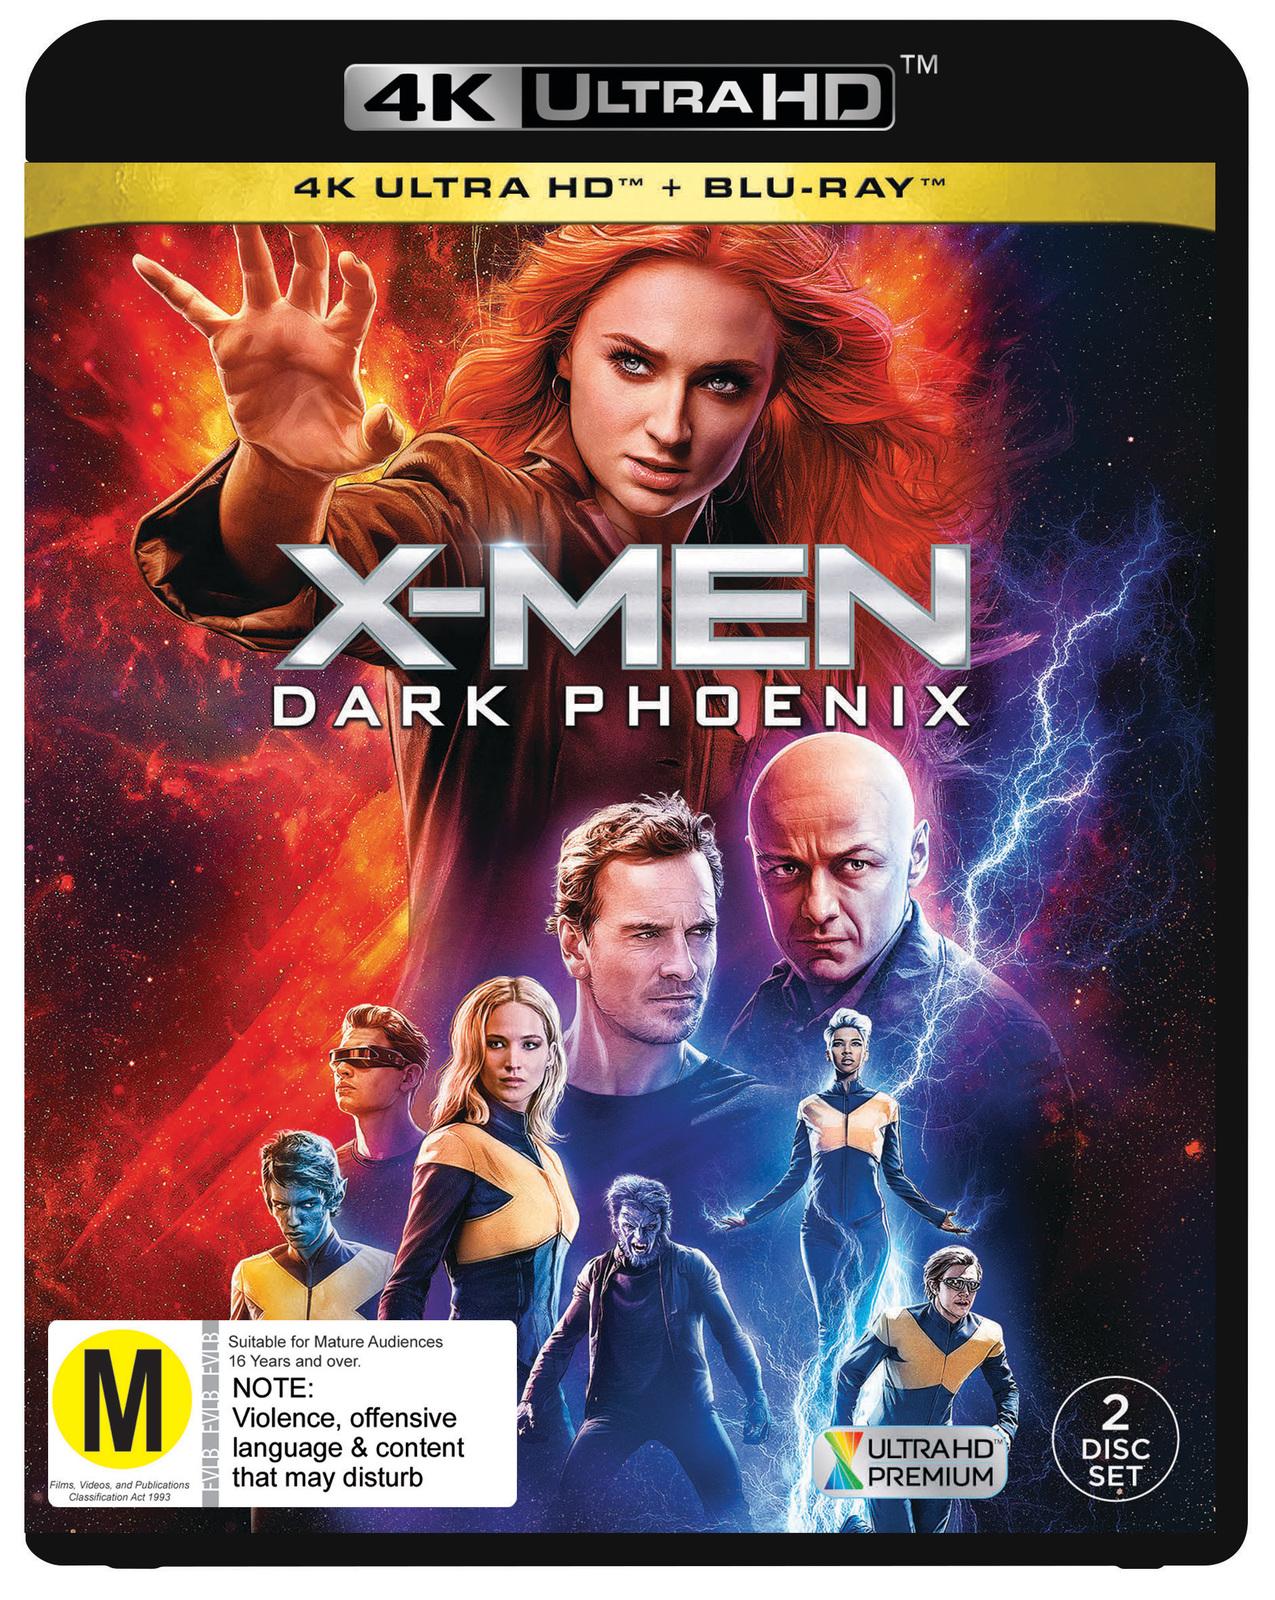 X-Men: Dark Phoenix on UHD Blu-ray image